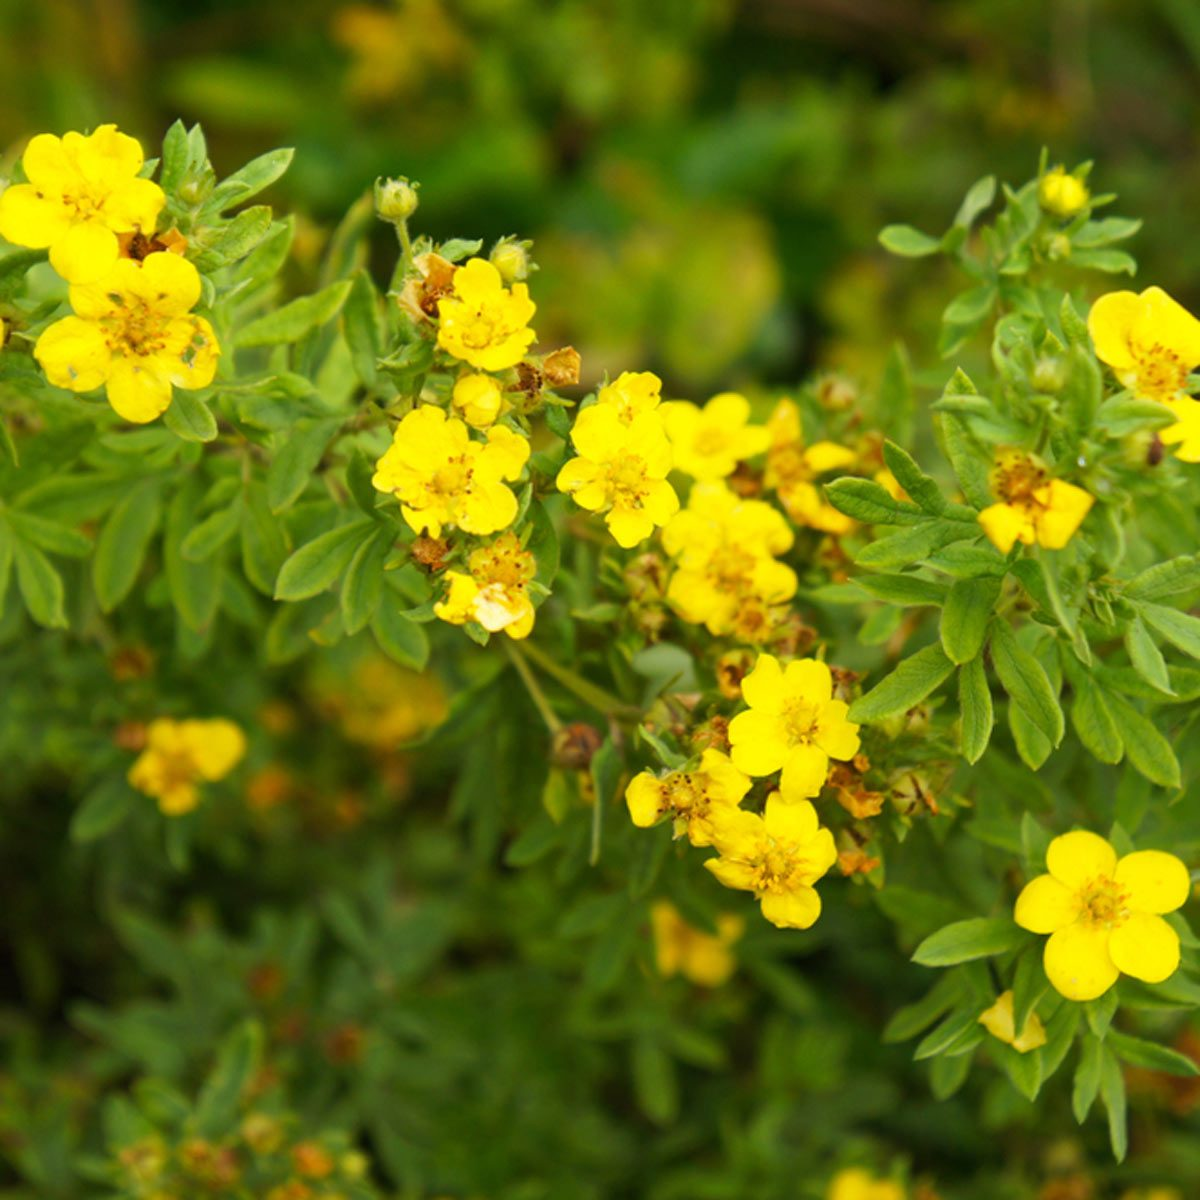 Potentilla flowering shrub